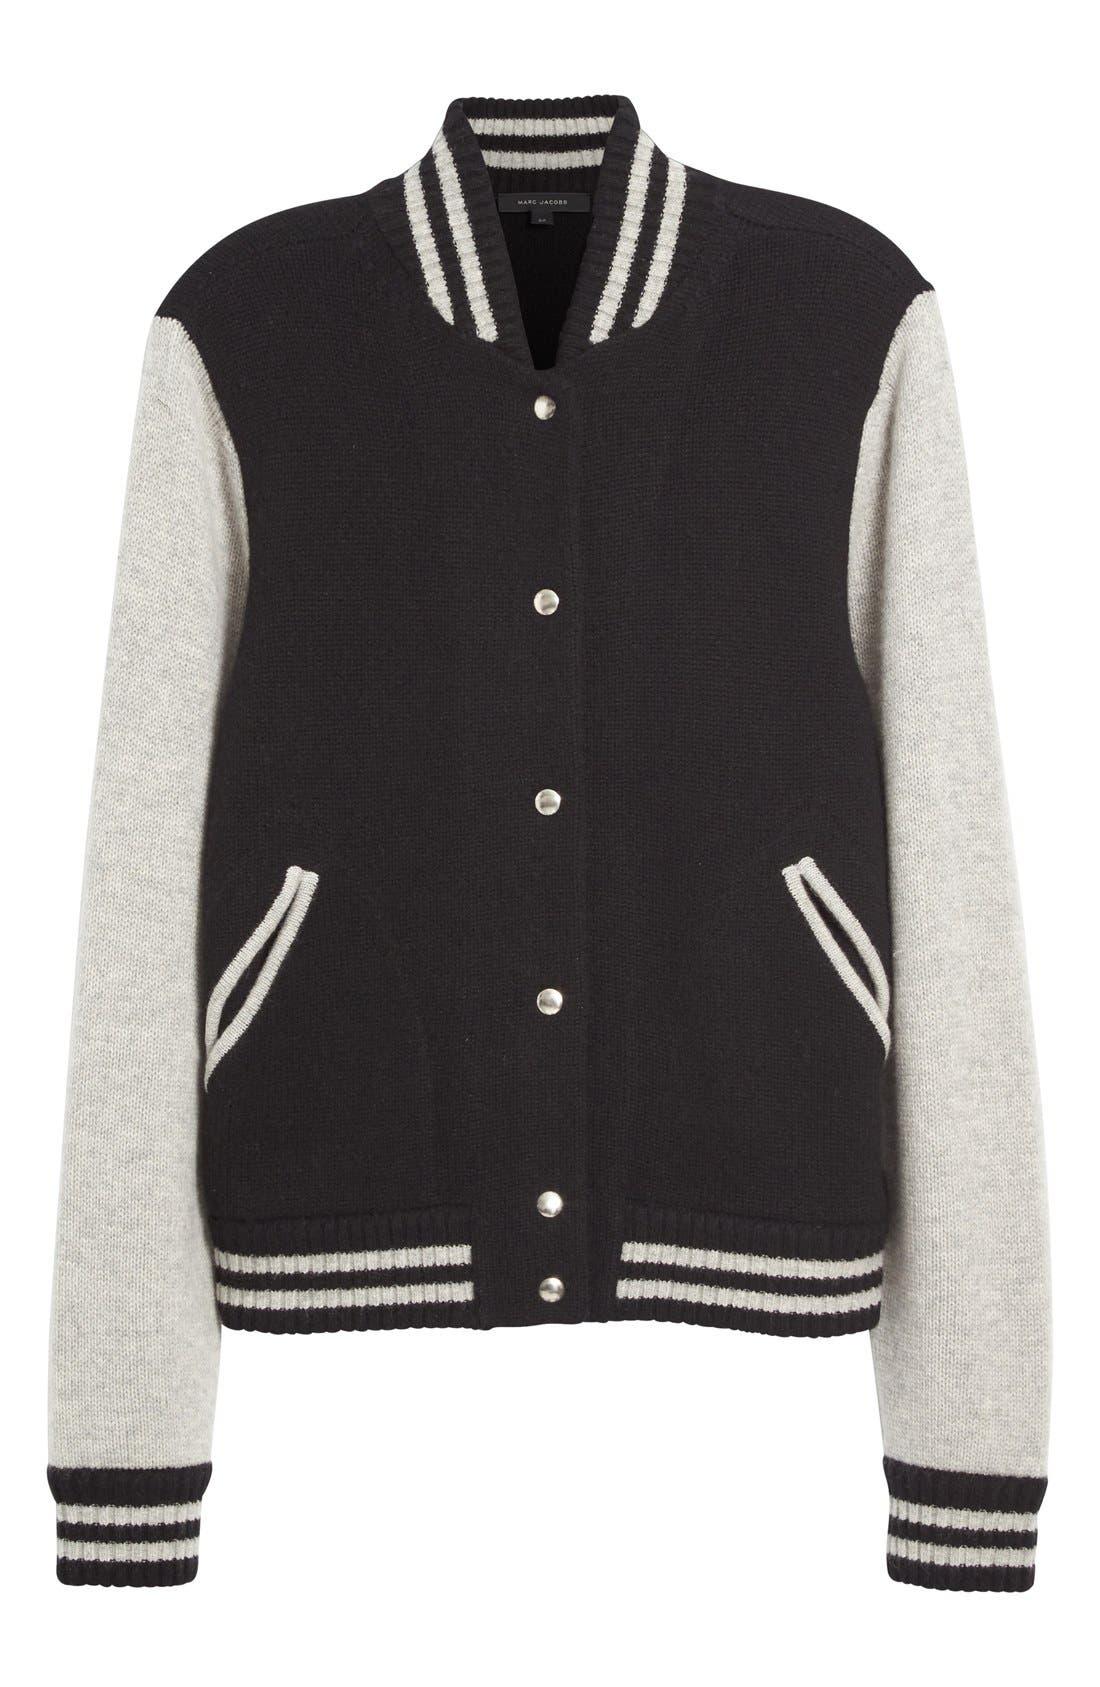 Stripe Detail Wool & Cashmere Knit Varsity Jacket,                             Alternate thumbnail 4, color,                             002